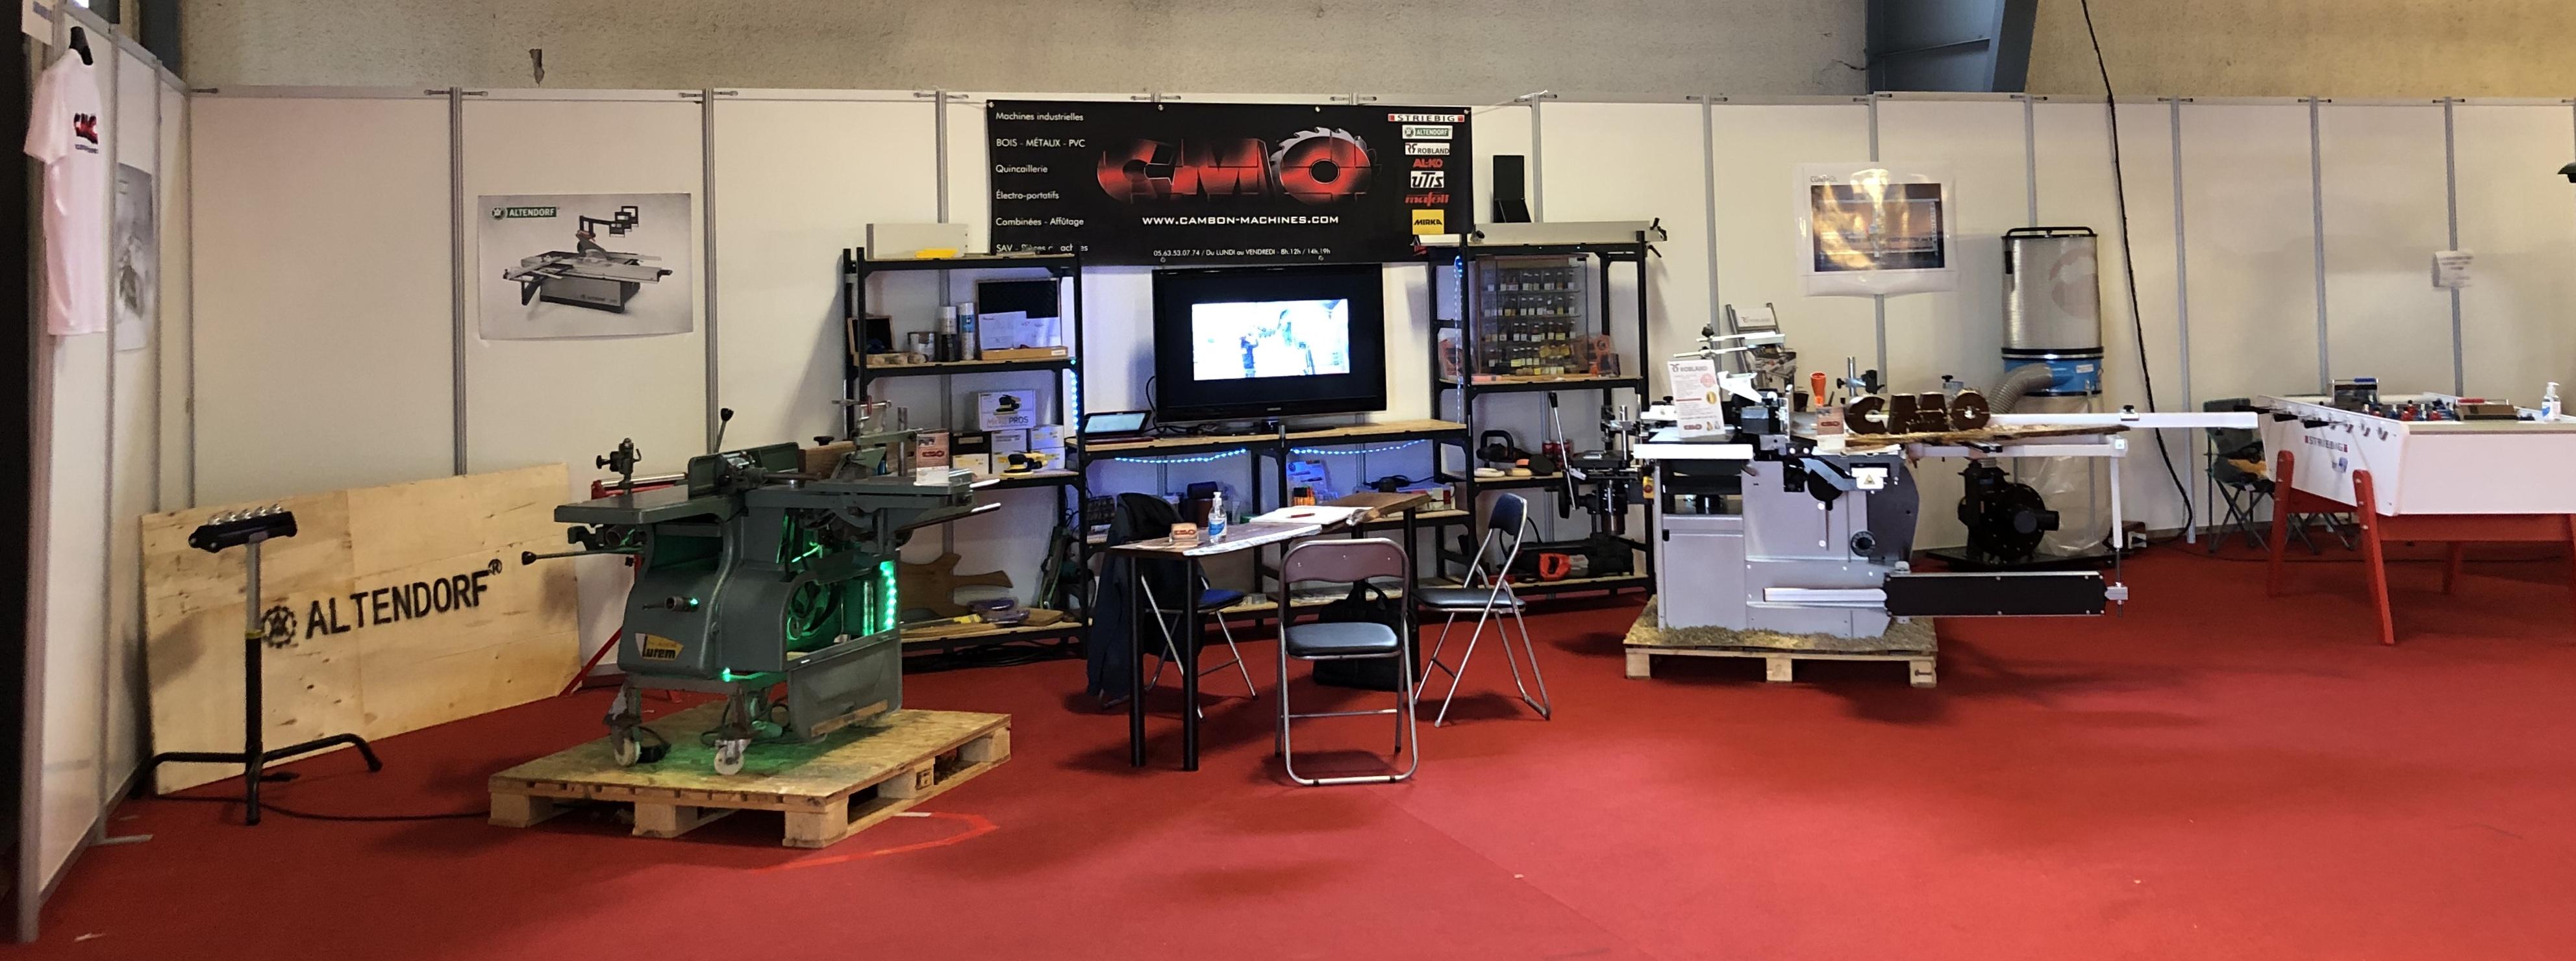 Salon Habitarn 2020 - Cambon Machines Outils - CMO - Albi 81